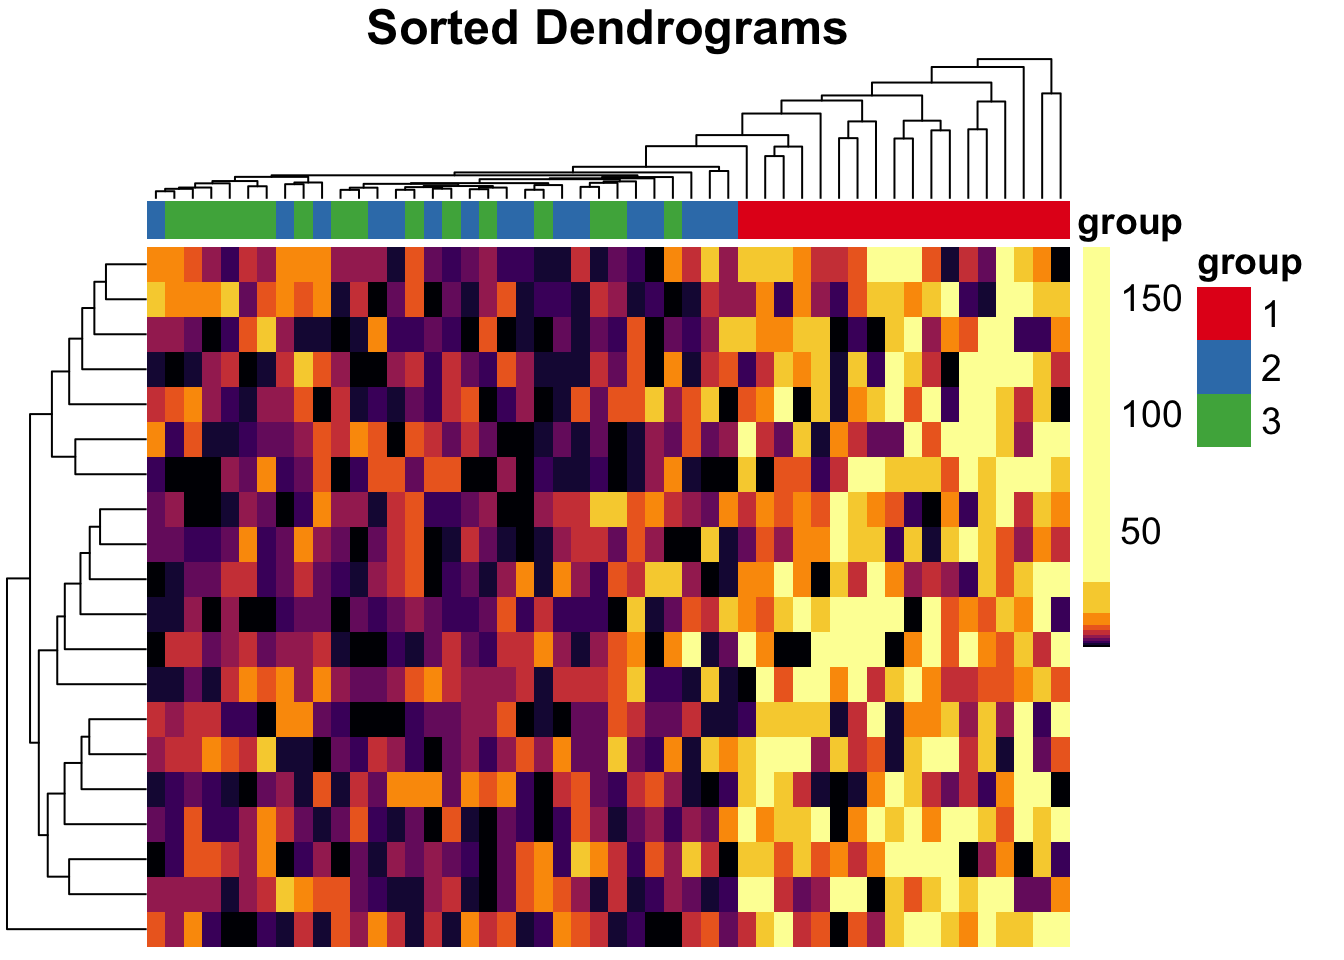 plot of chunk pheatmap-quantile-dendsort-example